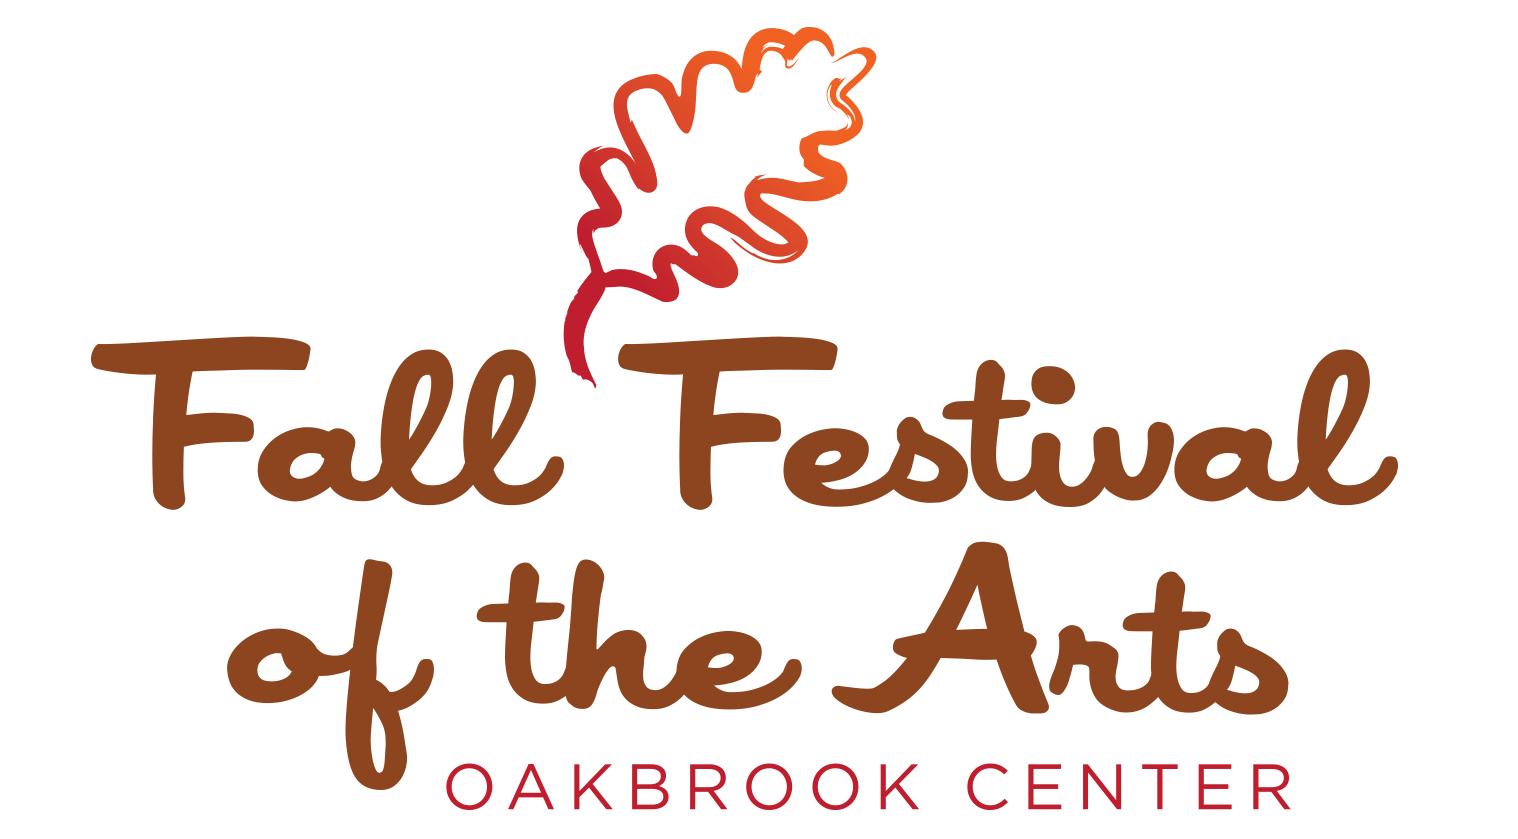 oakbrook art festival, fall festival of the arts, fall art festival at Oakbrook Center